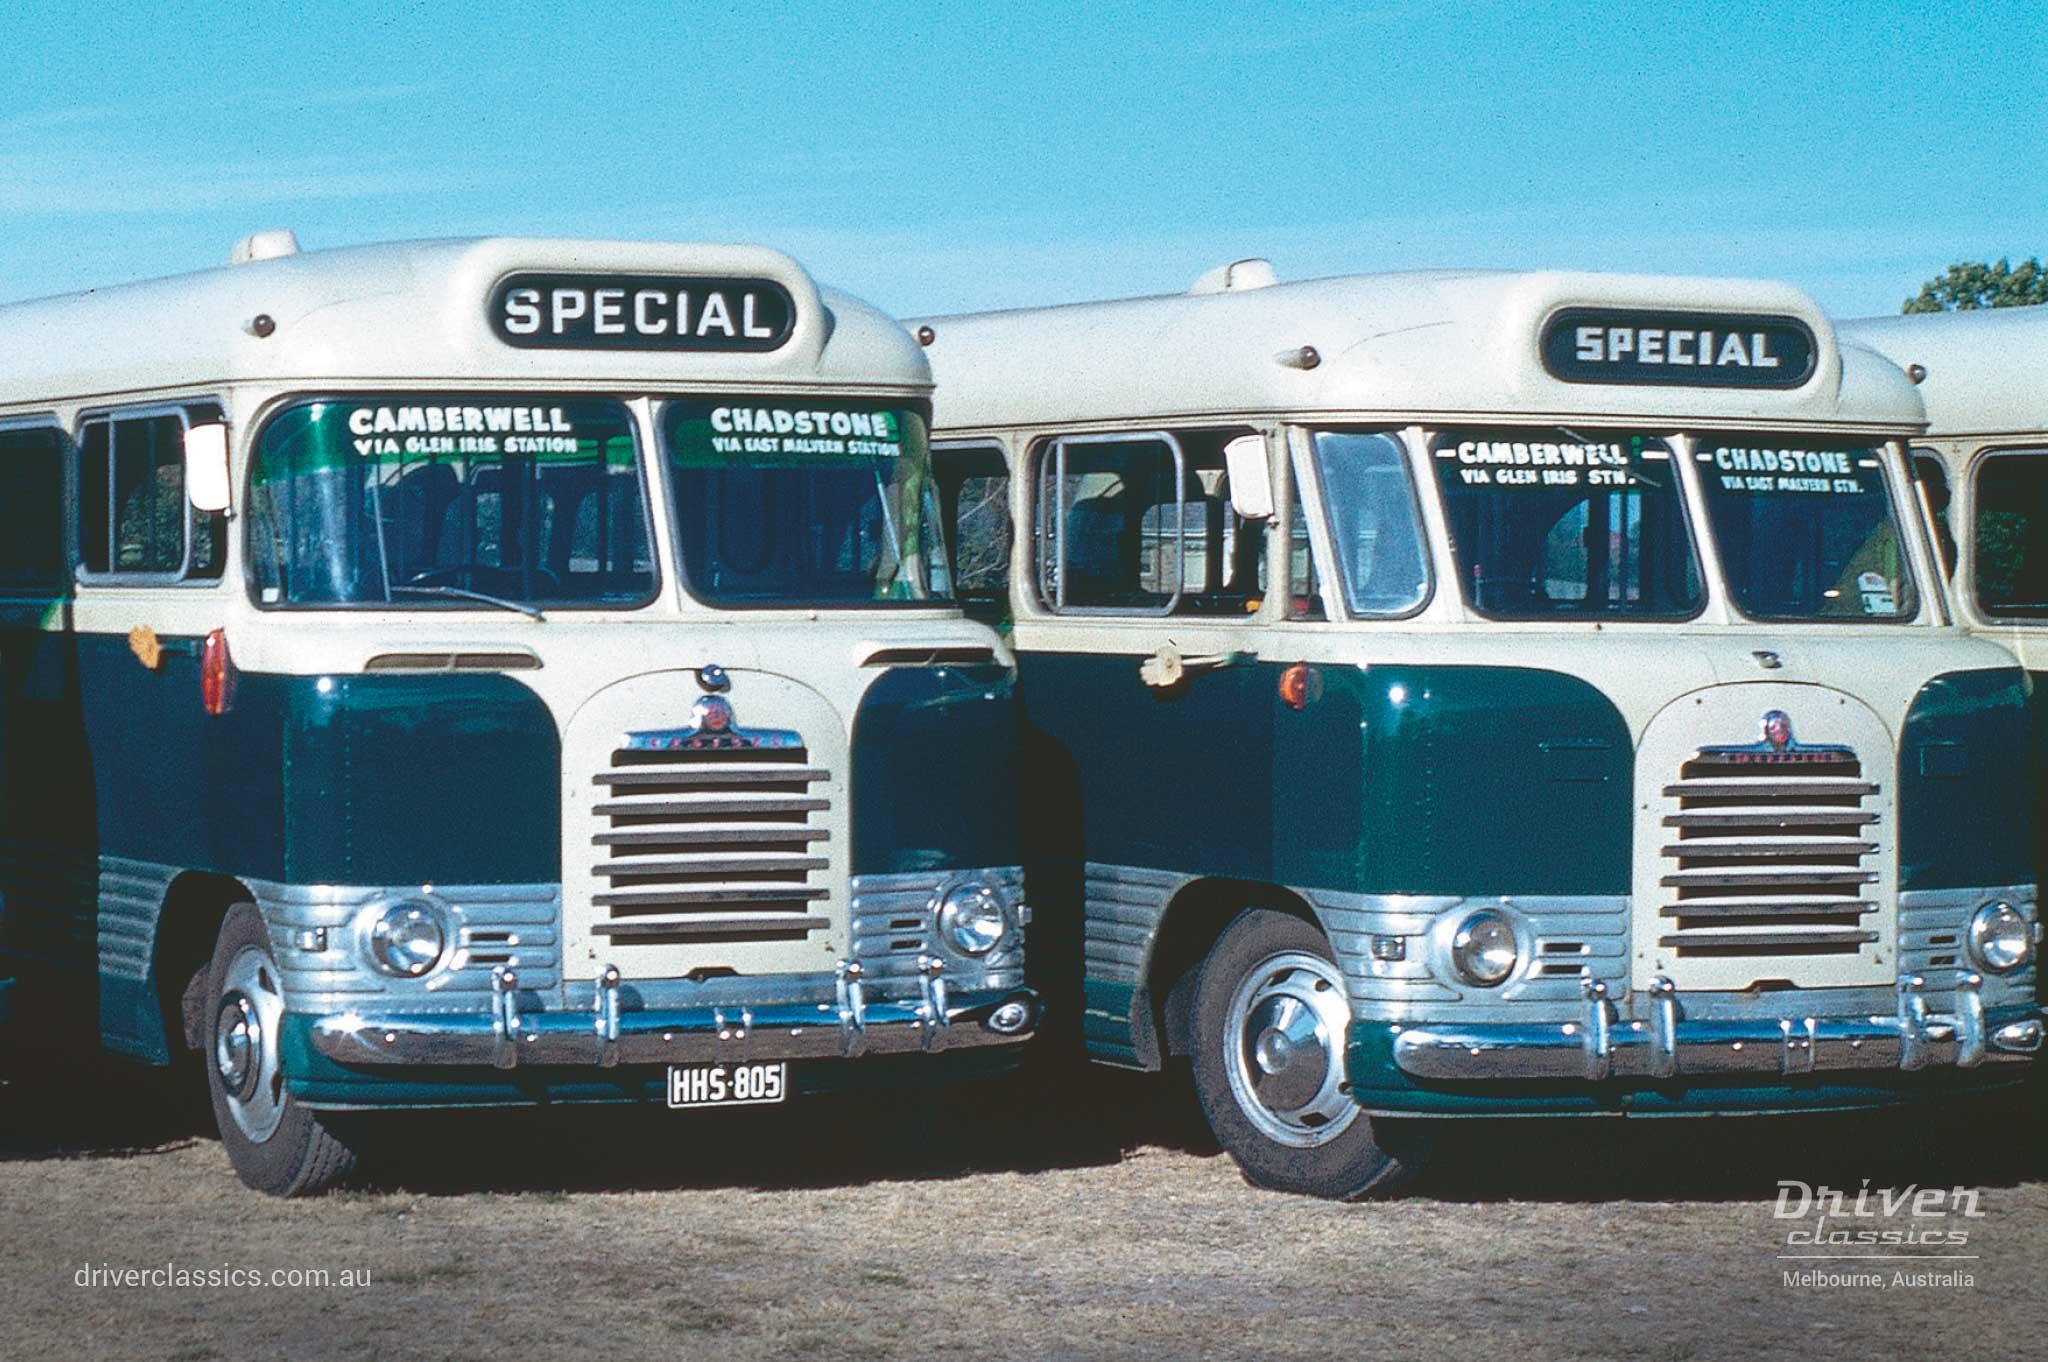 1961 Bedford SB3 wrap around version and 1957 Bedford SB3 flat screen version, photo taken 1962.